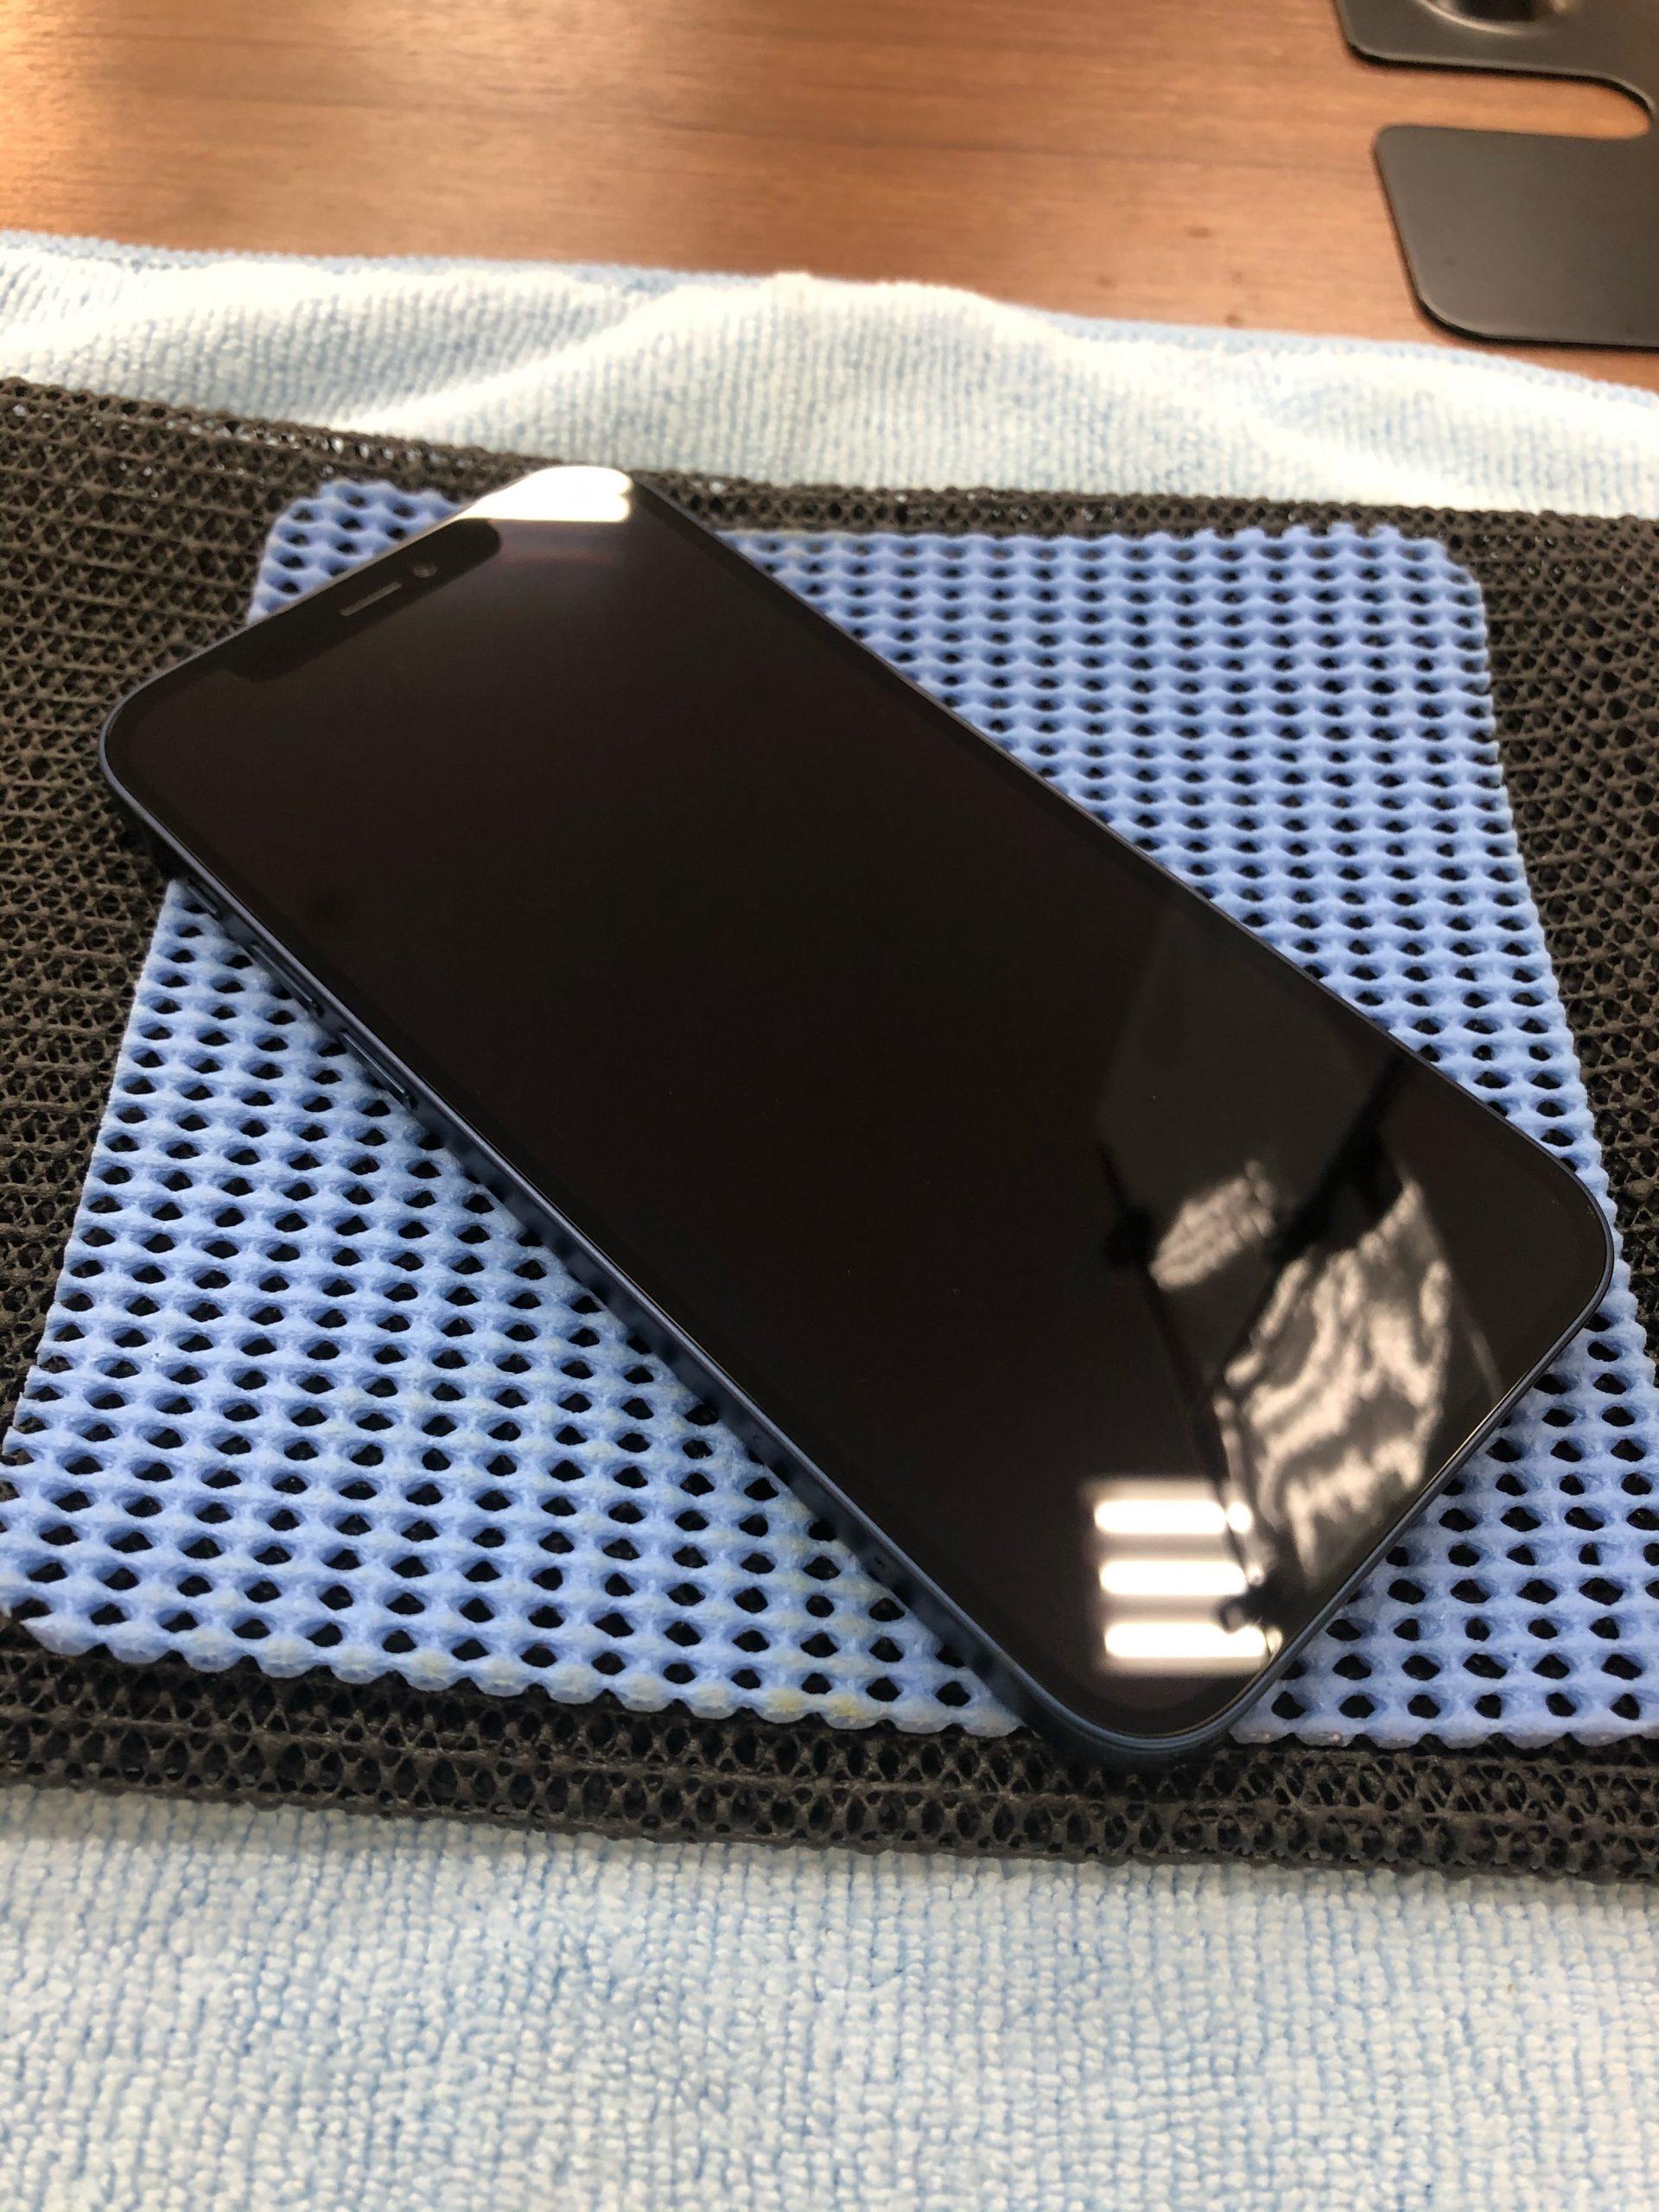 【iPhone12】ガラスコーティングで画面強化!〈多久市よりご来店〉